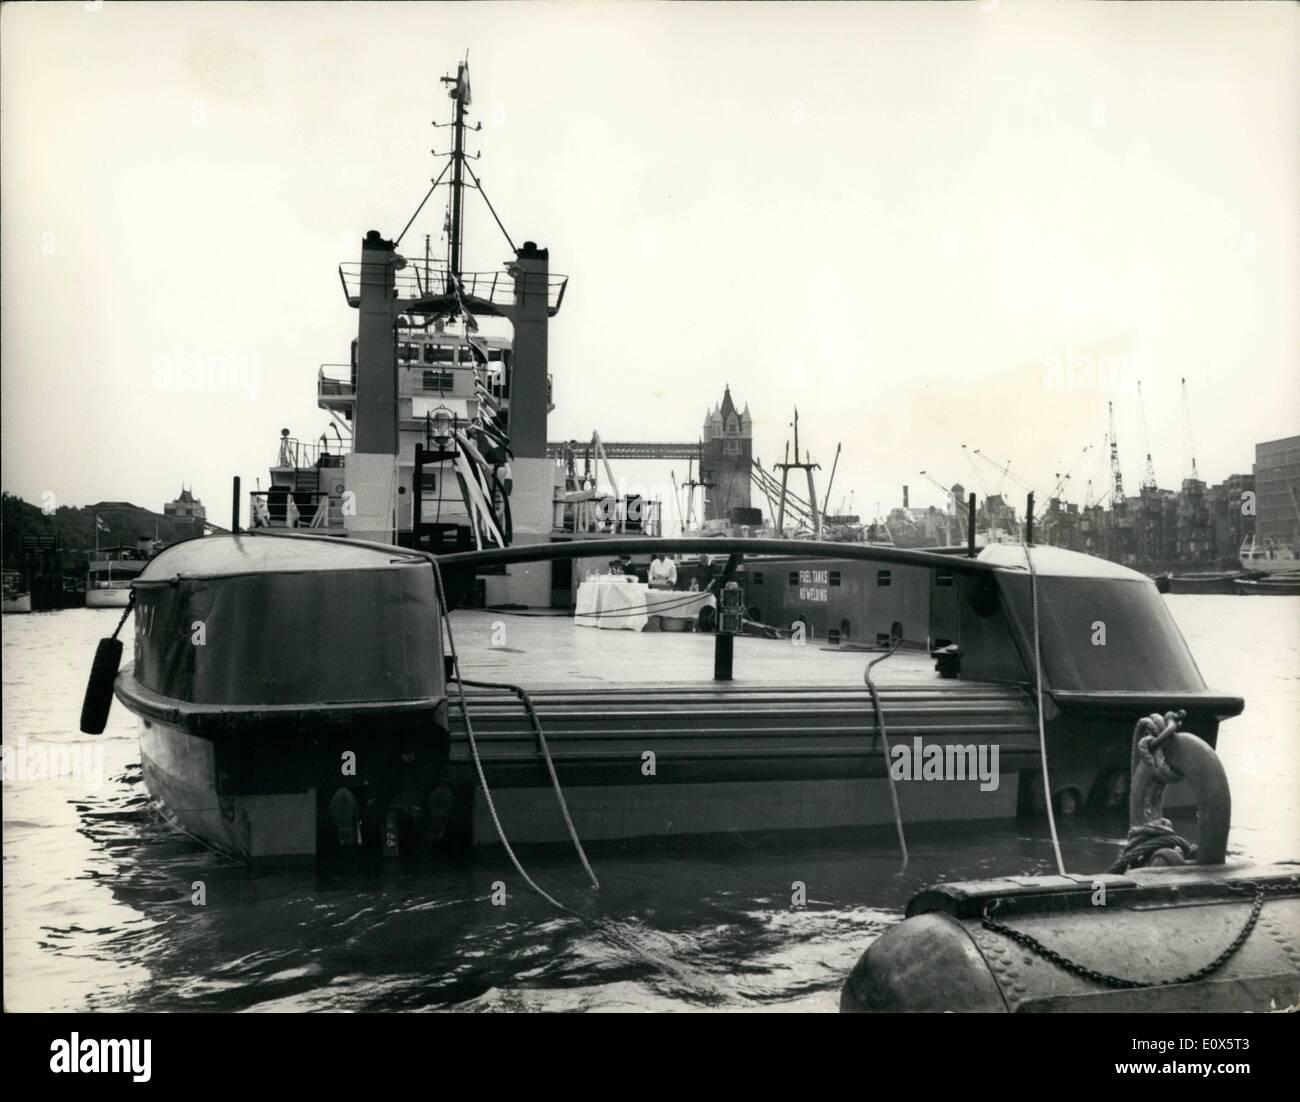 Jun. 06, 1965 - New Supply Vessel To Service North Sea Oil Rig: Continental Oil Company of England, the North Sea Stock Photo